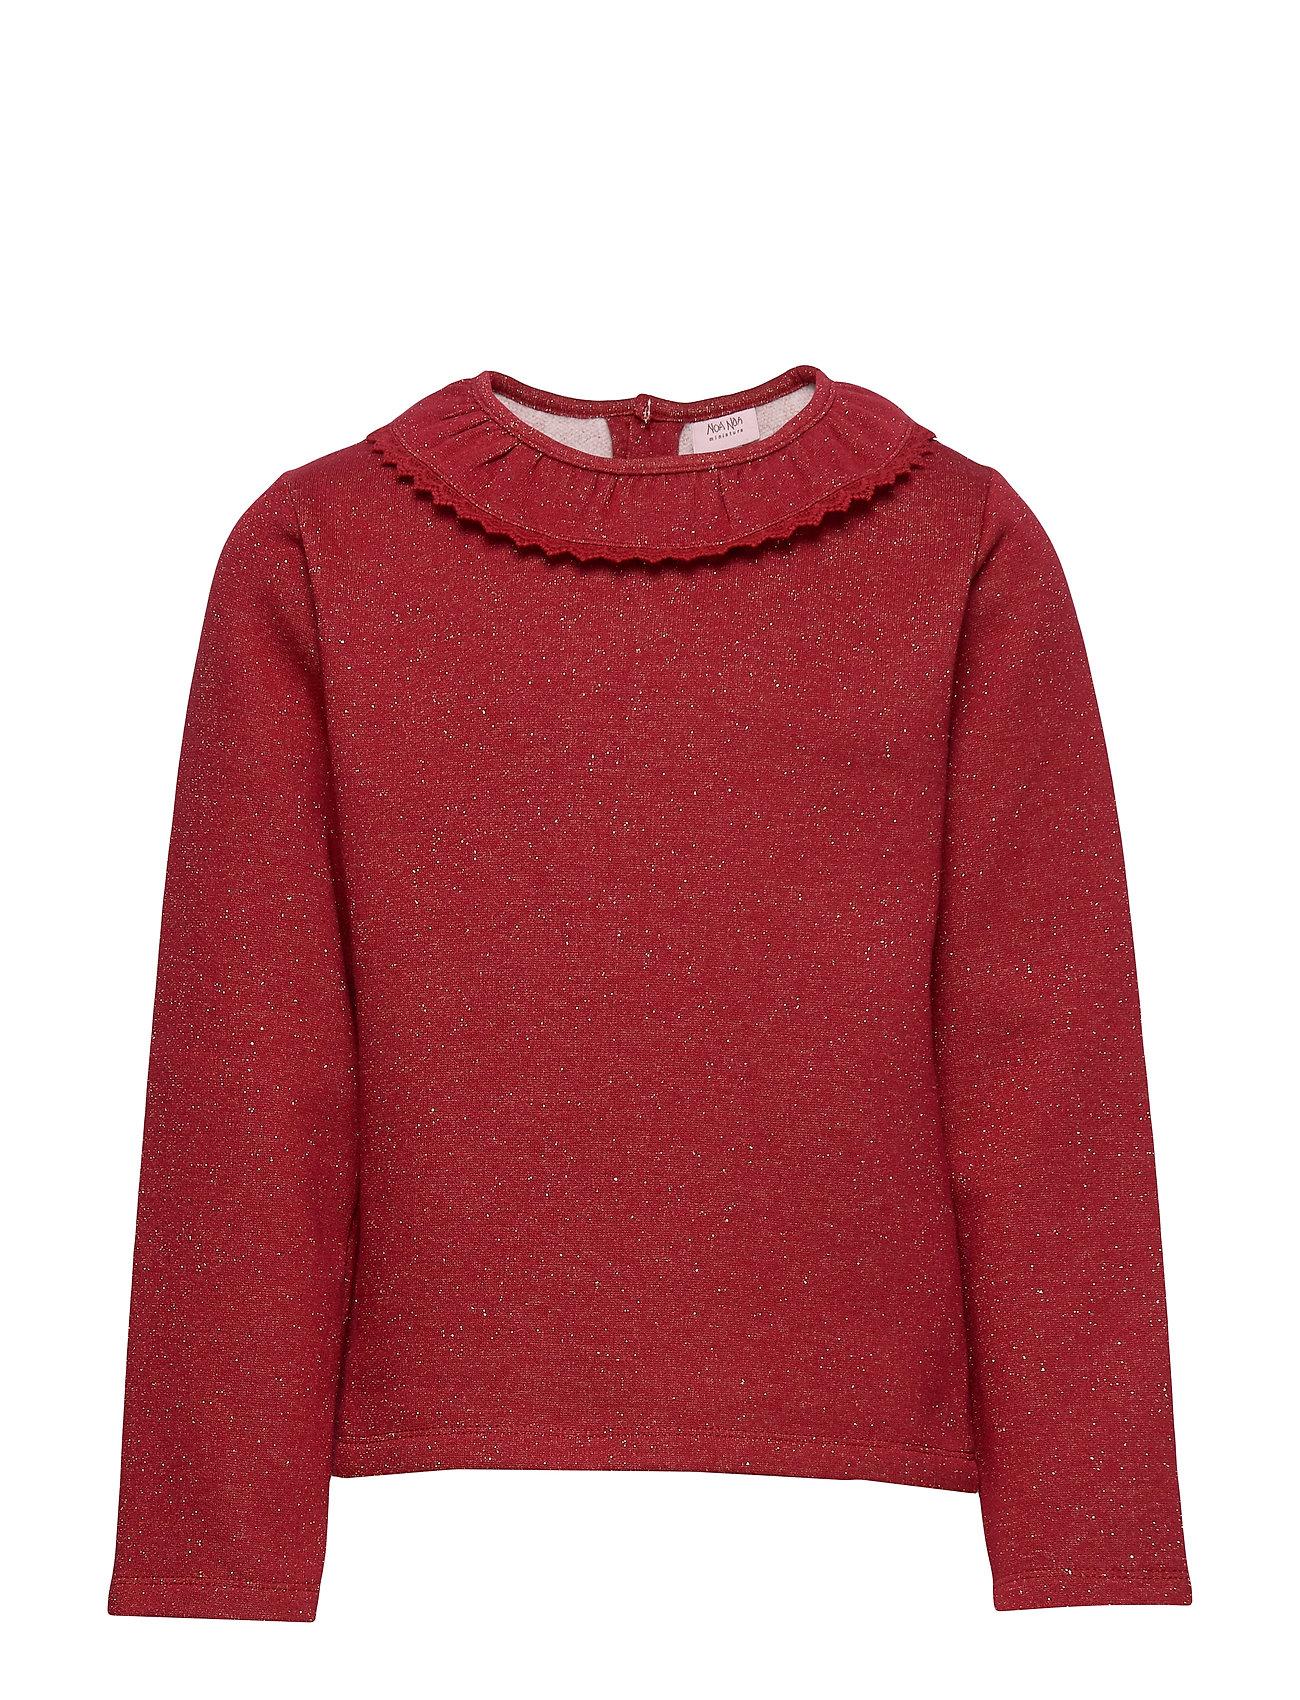 Noa Noa Miniature Sweatshirt - RED DAHLIA